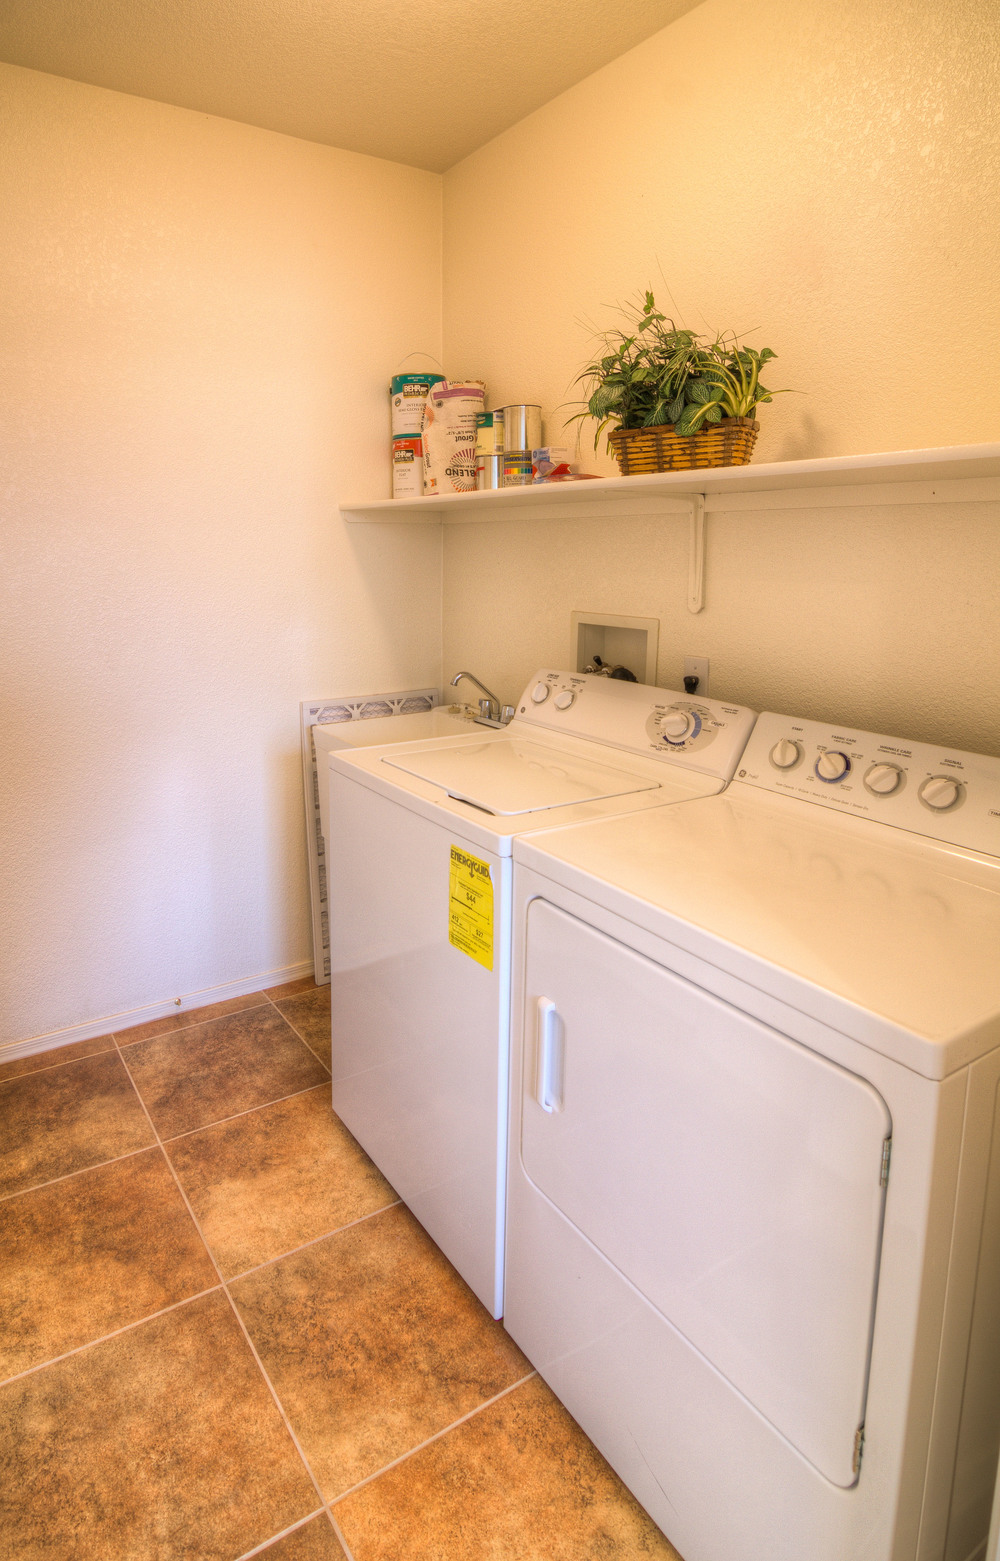 21 Laundry Room.jpg